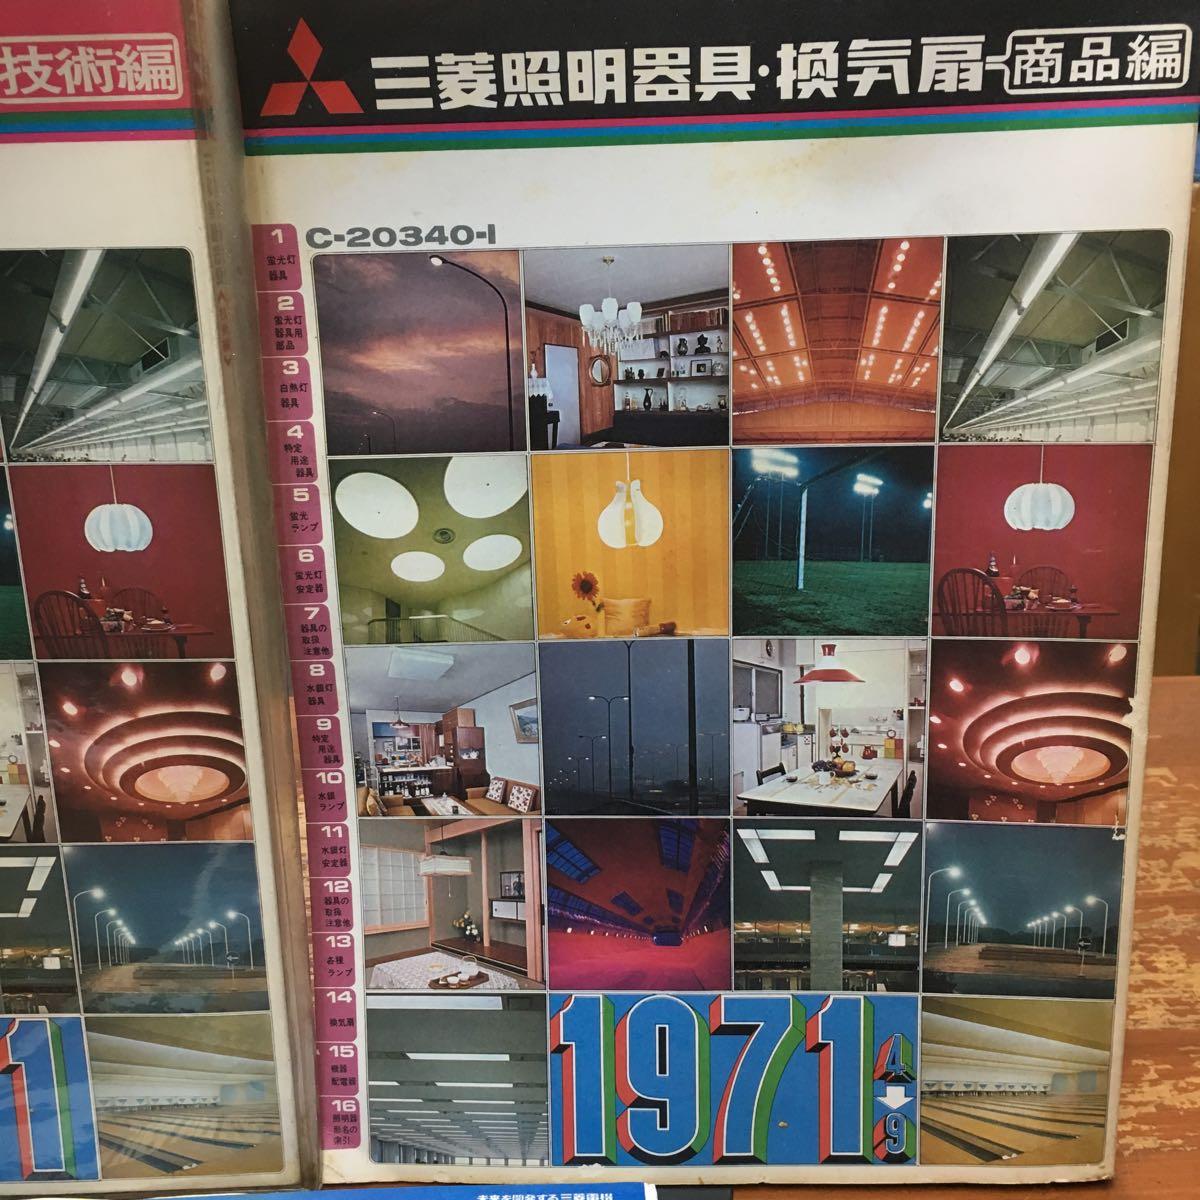 三菱照明器具/換気扇/カタログ/1971年・姿図集・照明器具技術編_画像3